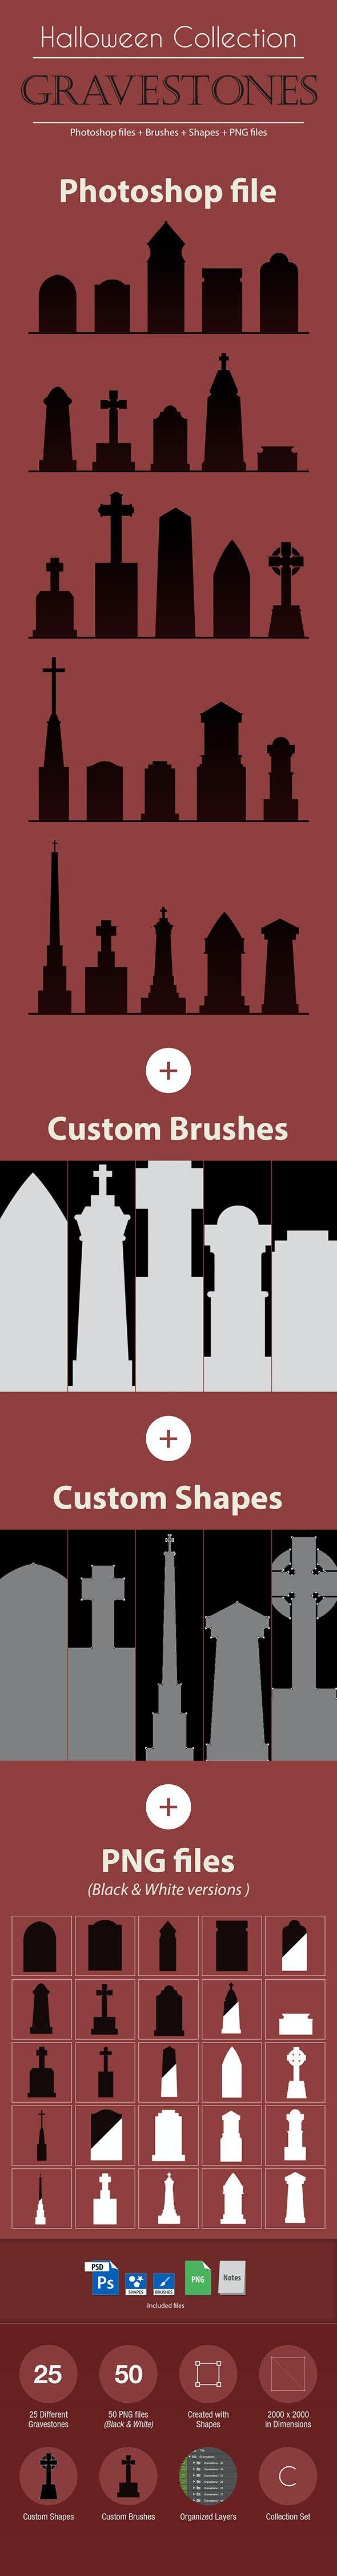 Halloween Collection - Gravestones - Photoshop Add-ons